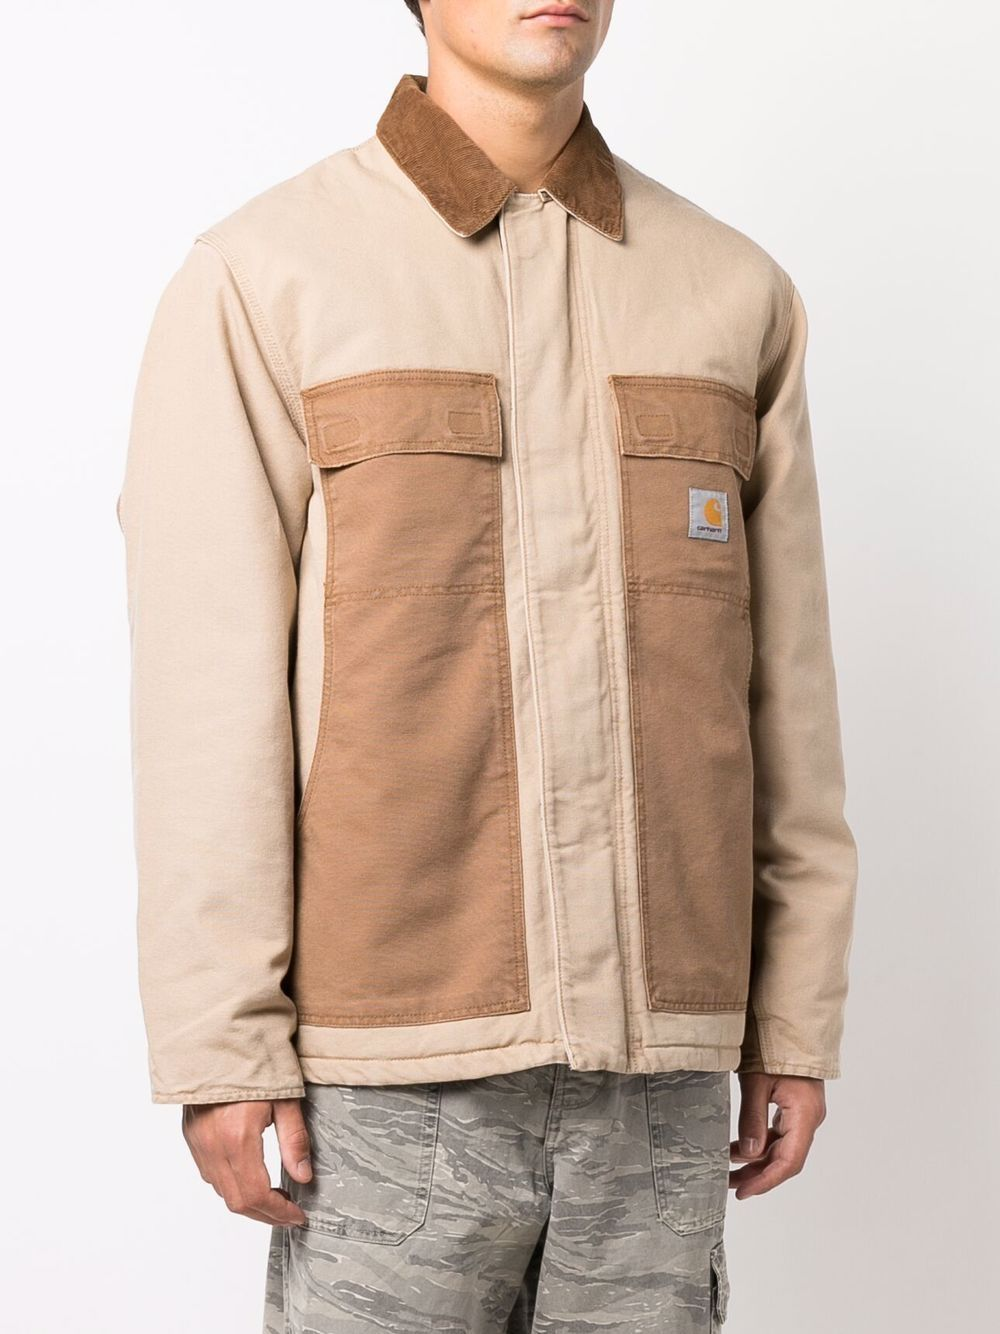 giacca og arctic uomo beige in cotone CARHARTT WIP   Cappotti   I0297690ID.3K